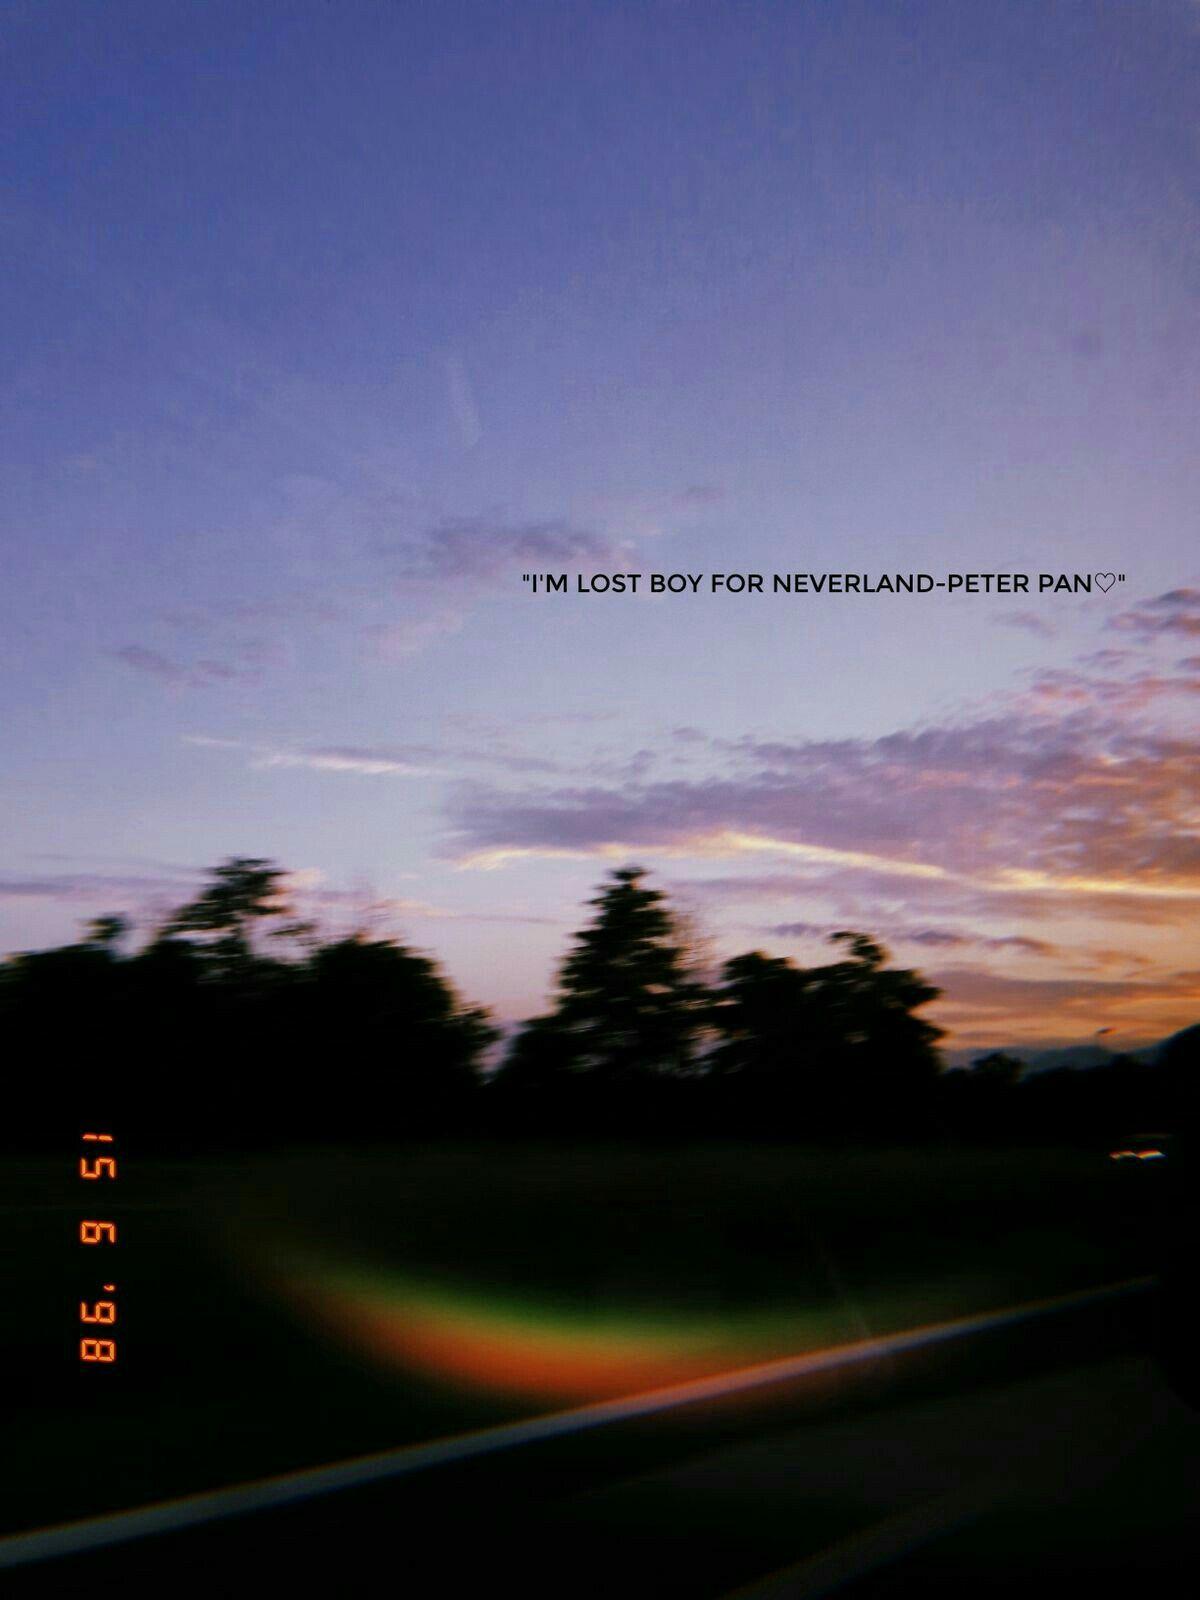 Iphone Tumblr Aesthetic Wallpaper Quotes Novocom Top